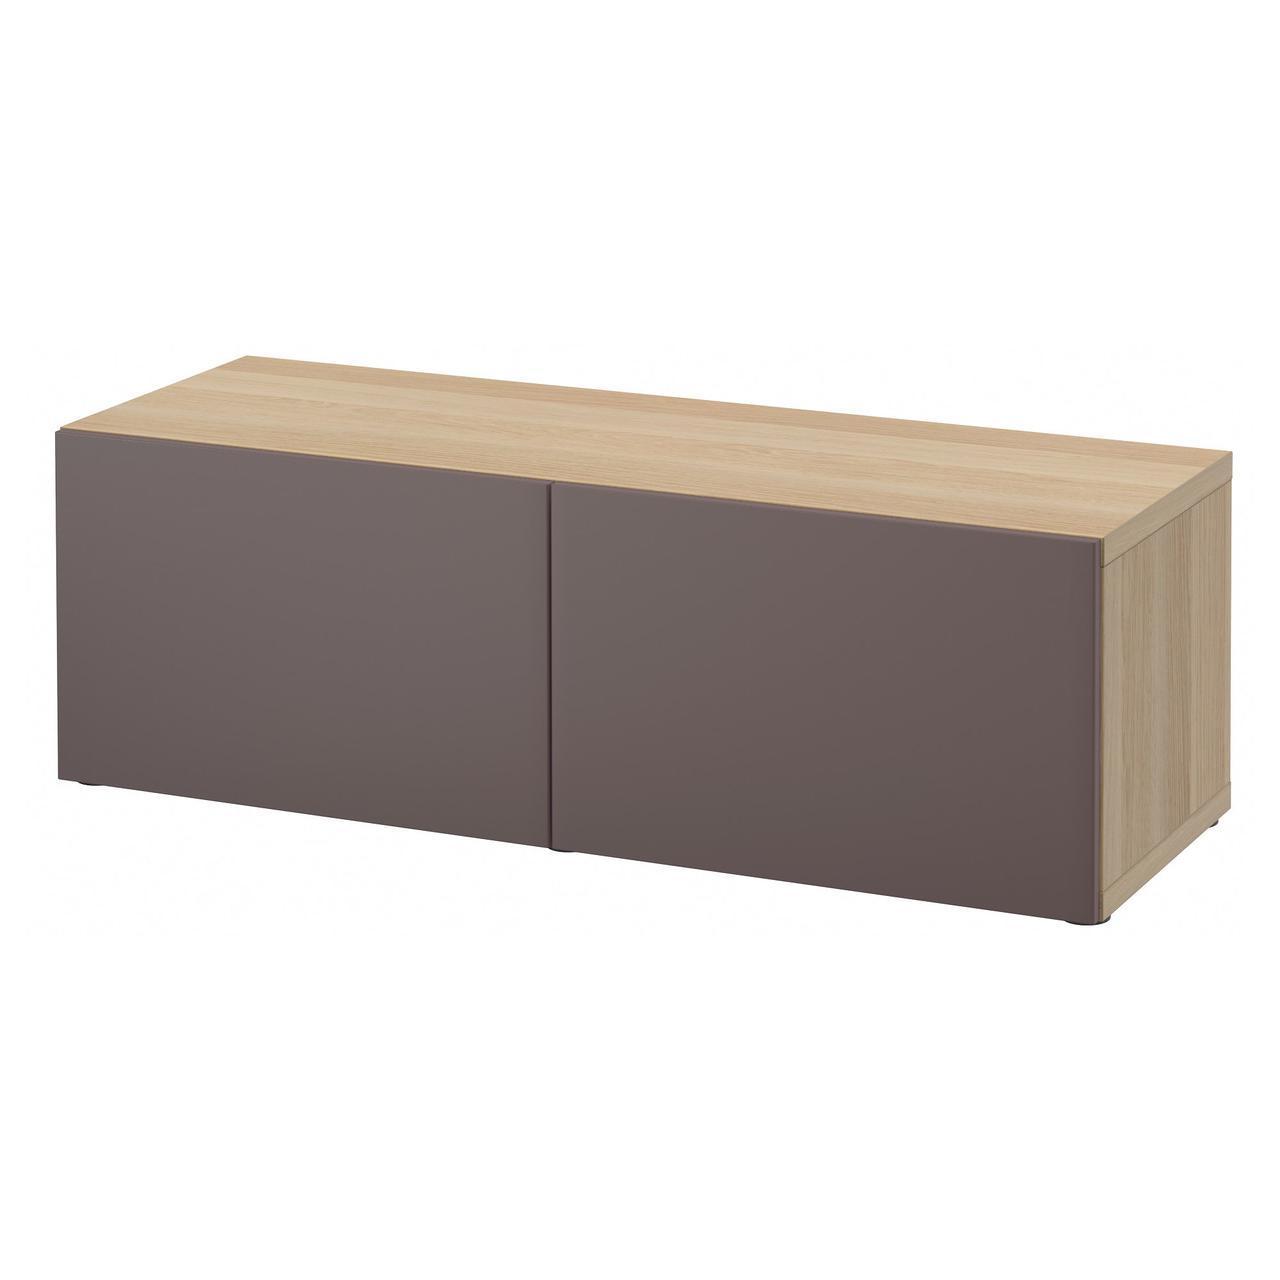 IKEA BESTA (691.329.46) Шкаф с дверью